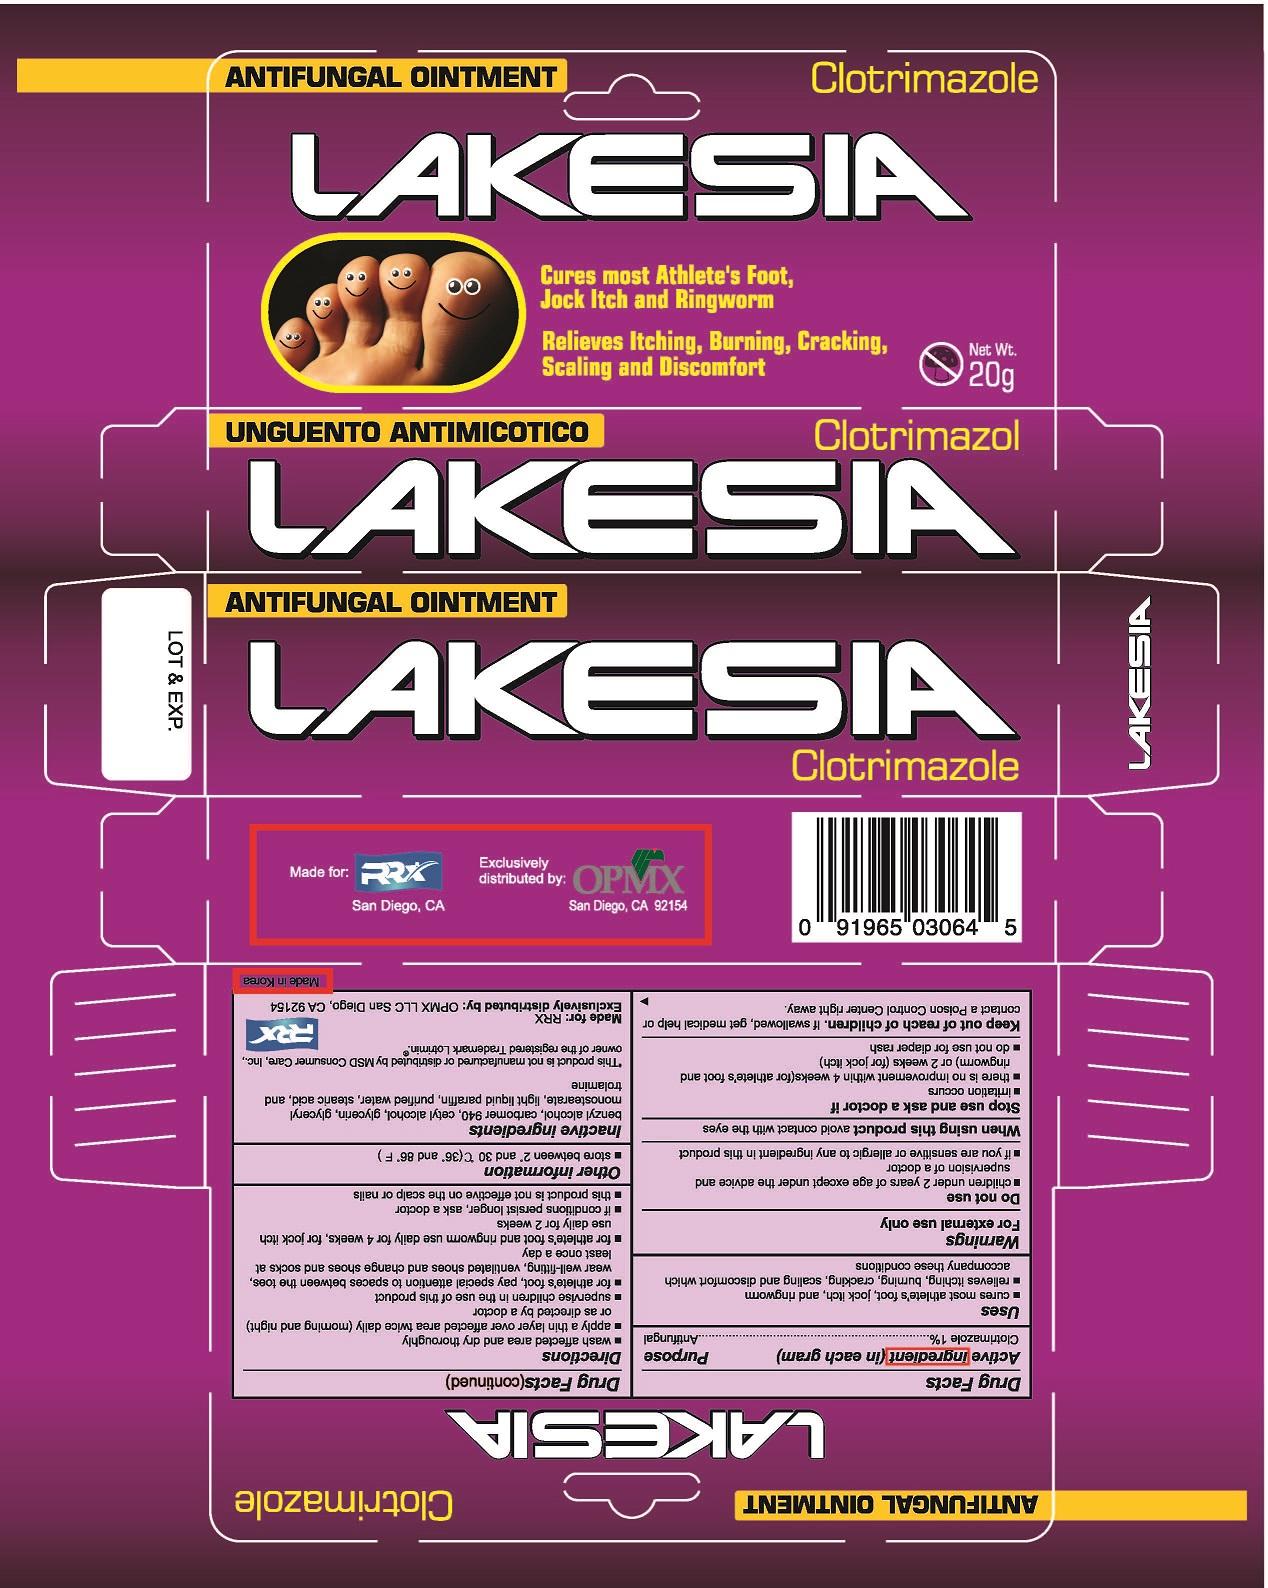 Lakesia (Clotrimazole) Cream [Opmx Llc]